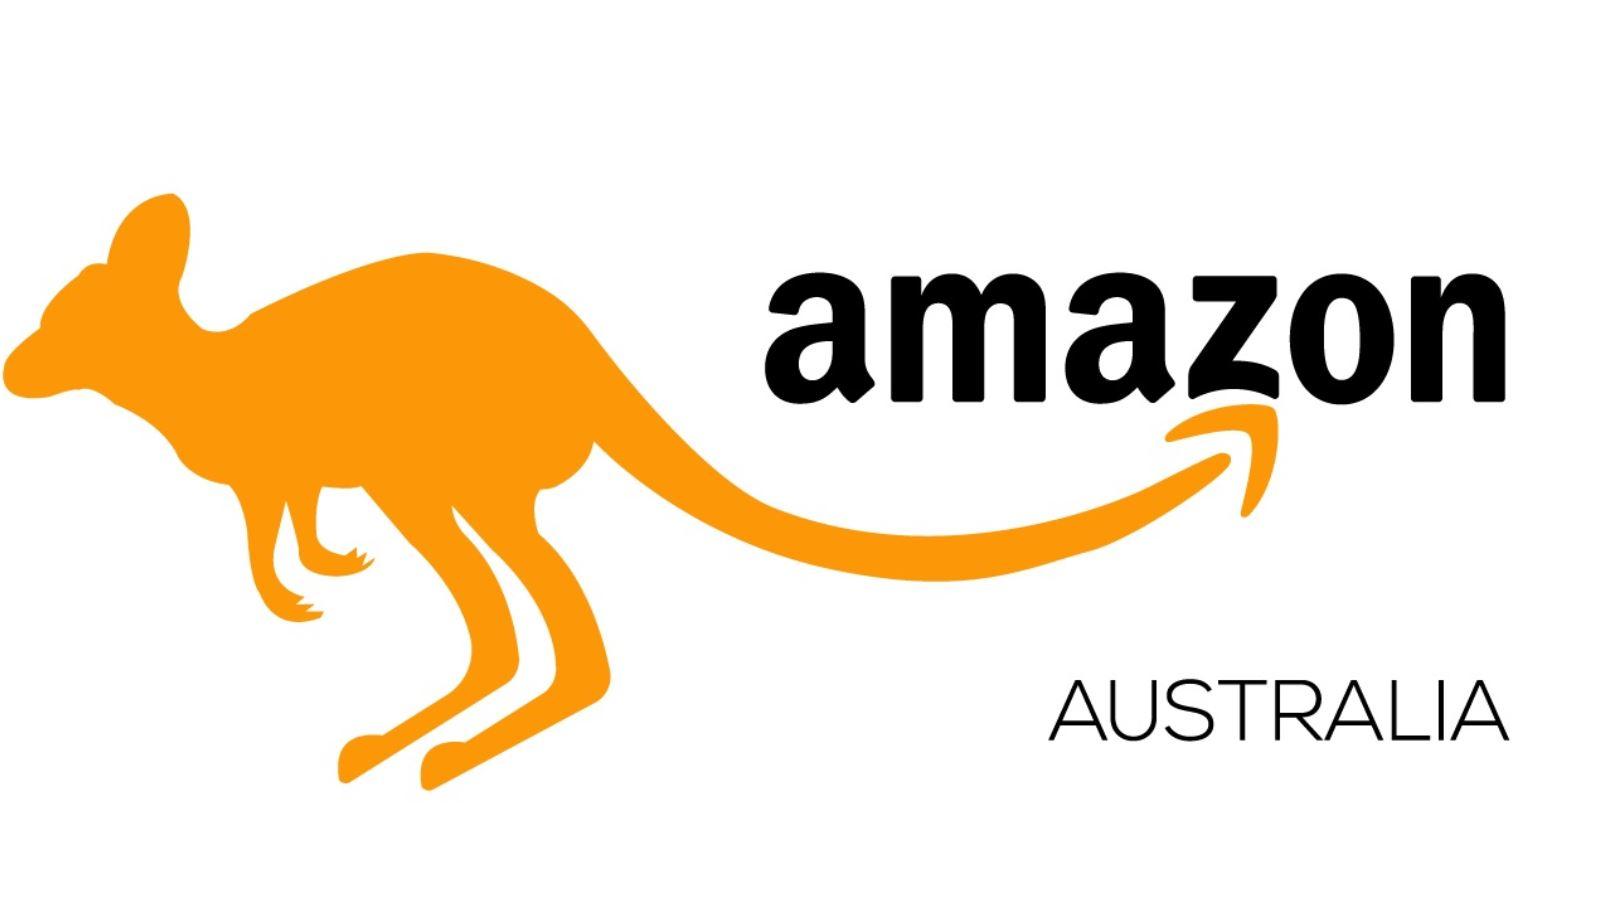 Pharma News - Amazon Australia to disrupt community pharmacy model